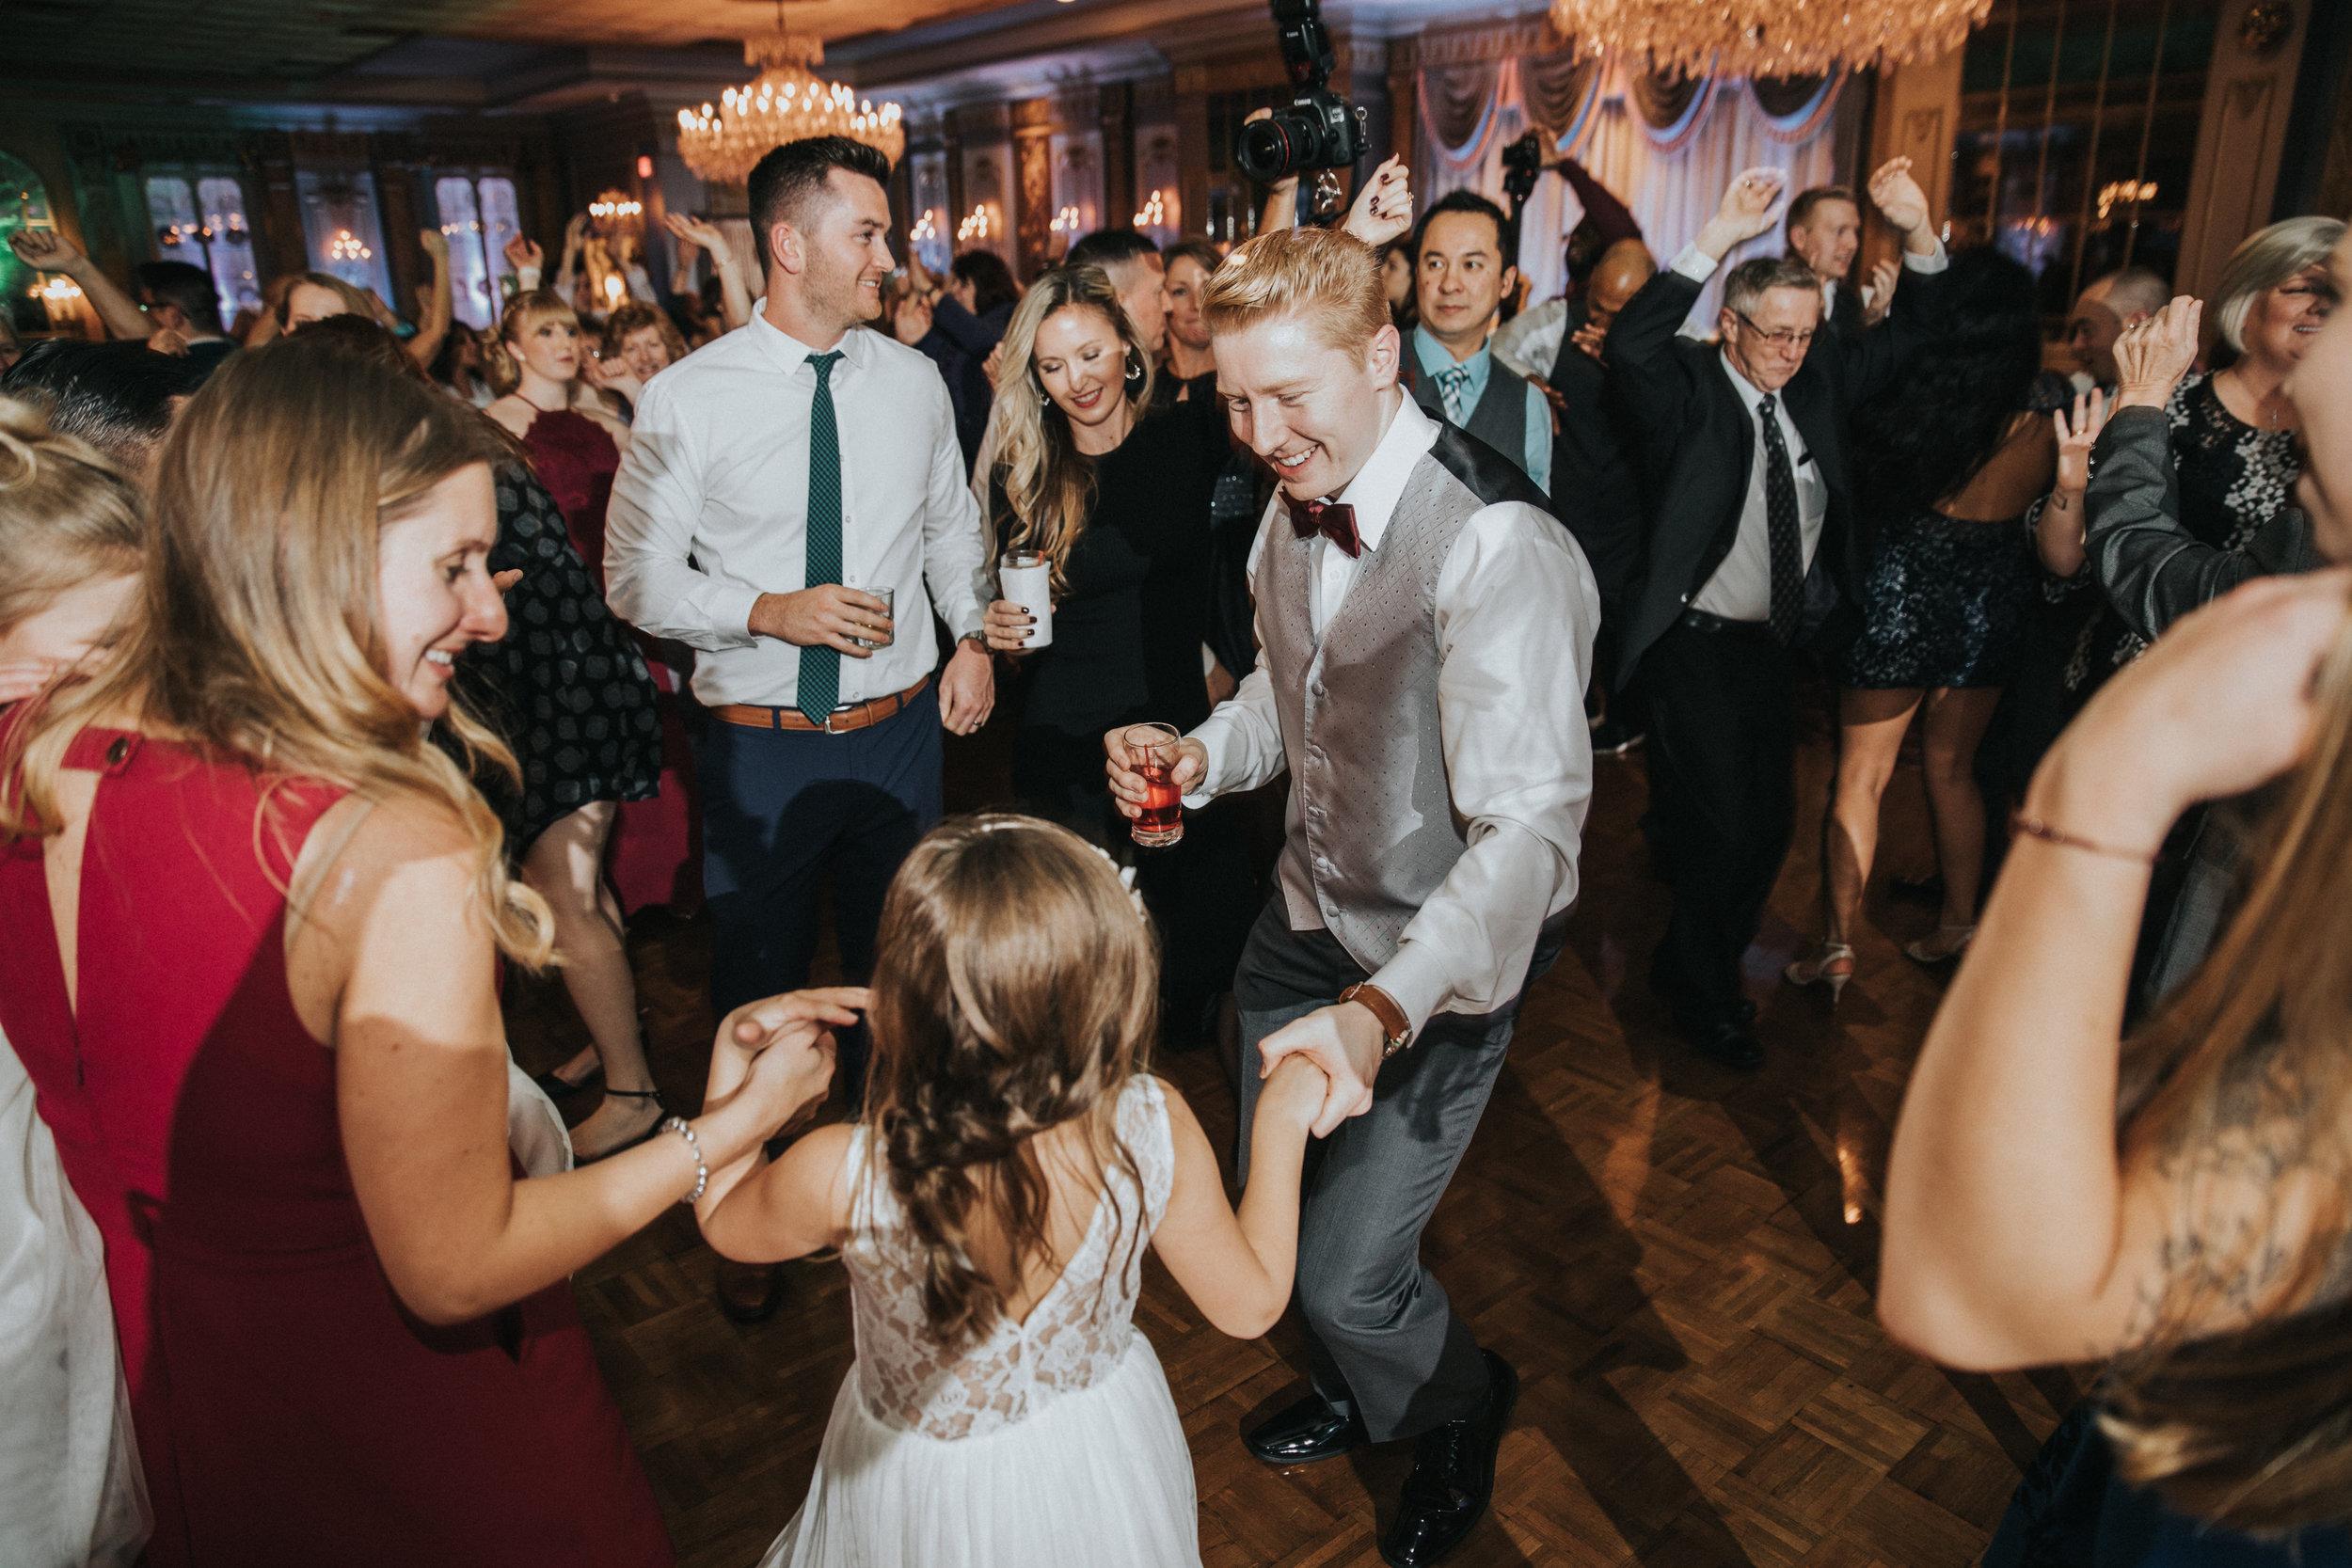 New-Jersey-Wedding-Photography-Fishers-Tudor-House-JennaLynnPhotography-Reception-Kathleen&Eddie-179.jpg